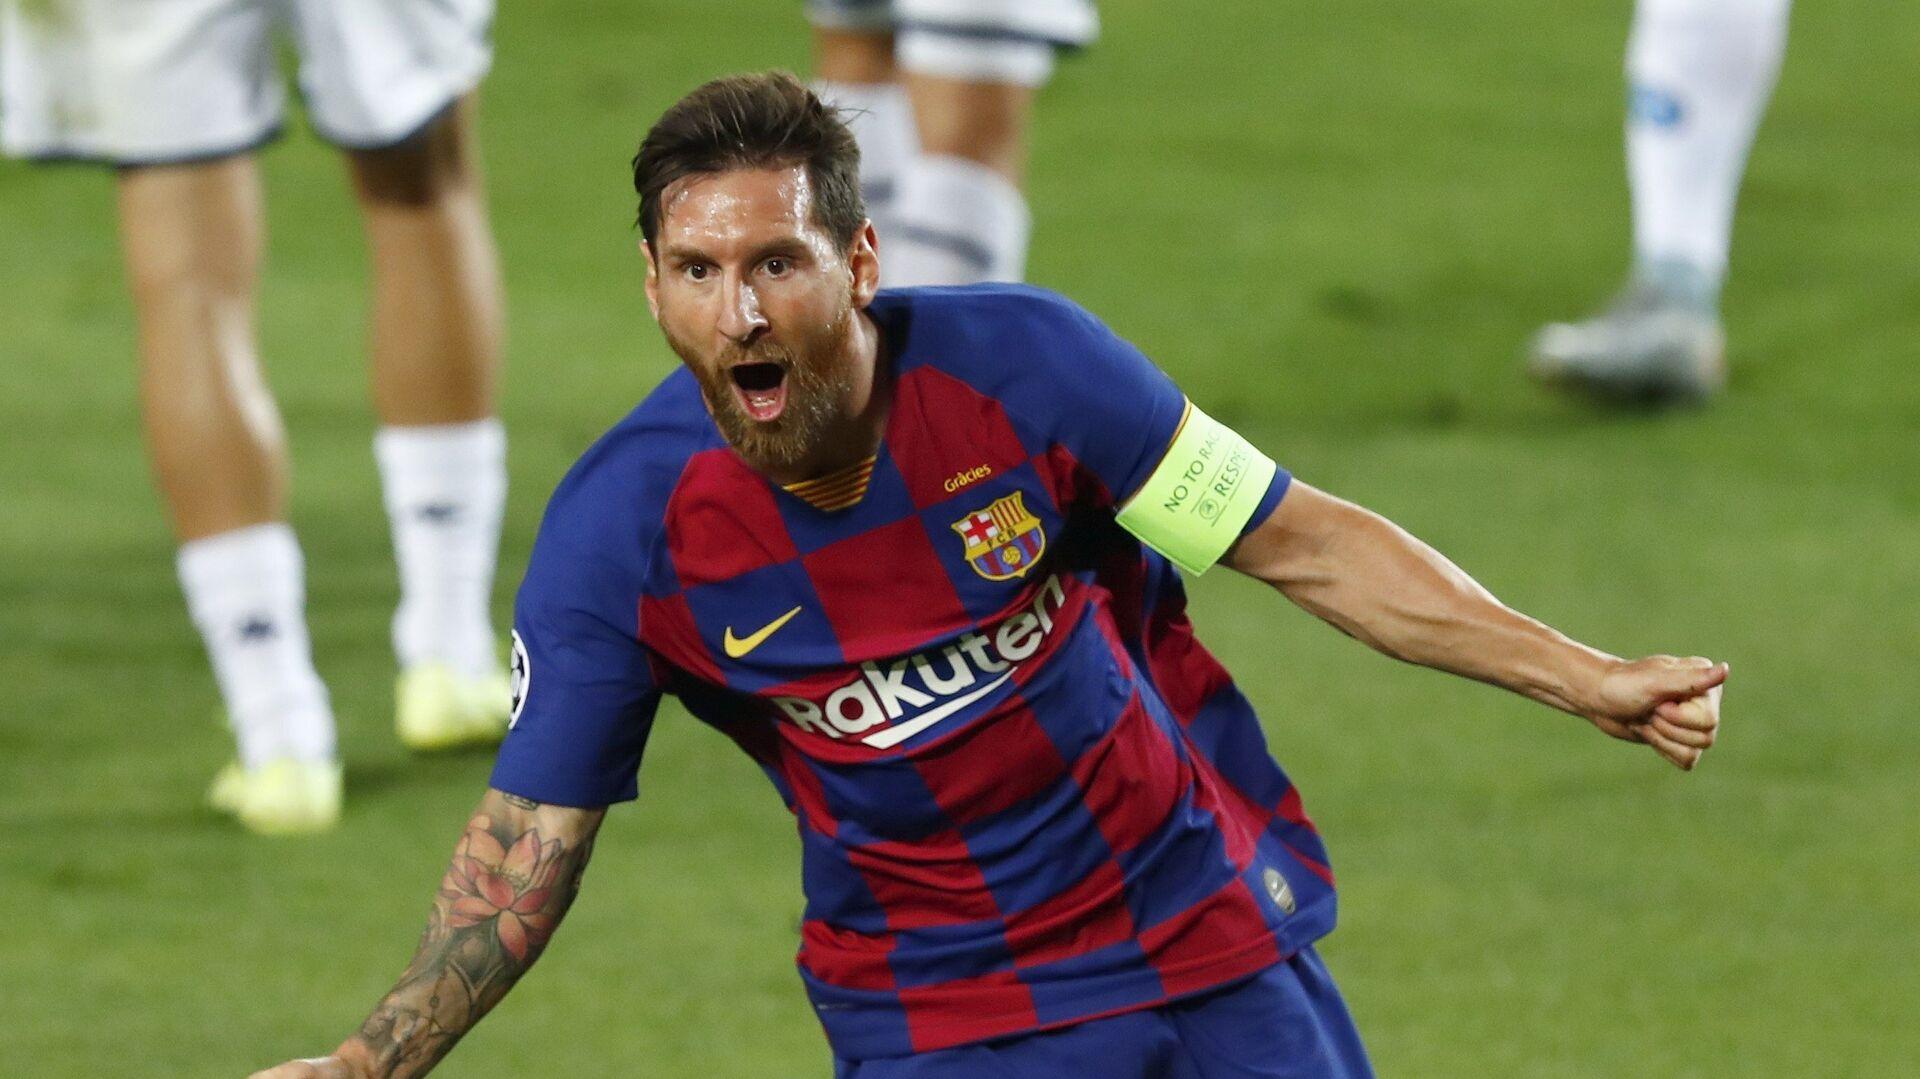 Leo Messi, futbolista argentino - Sputnik Mundo, 1920, 05.08.2021